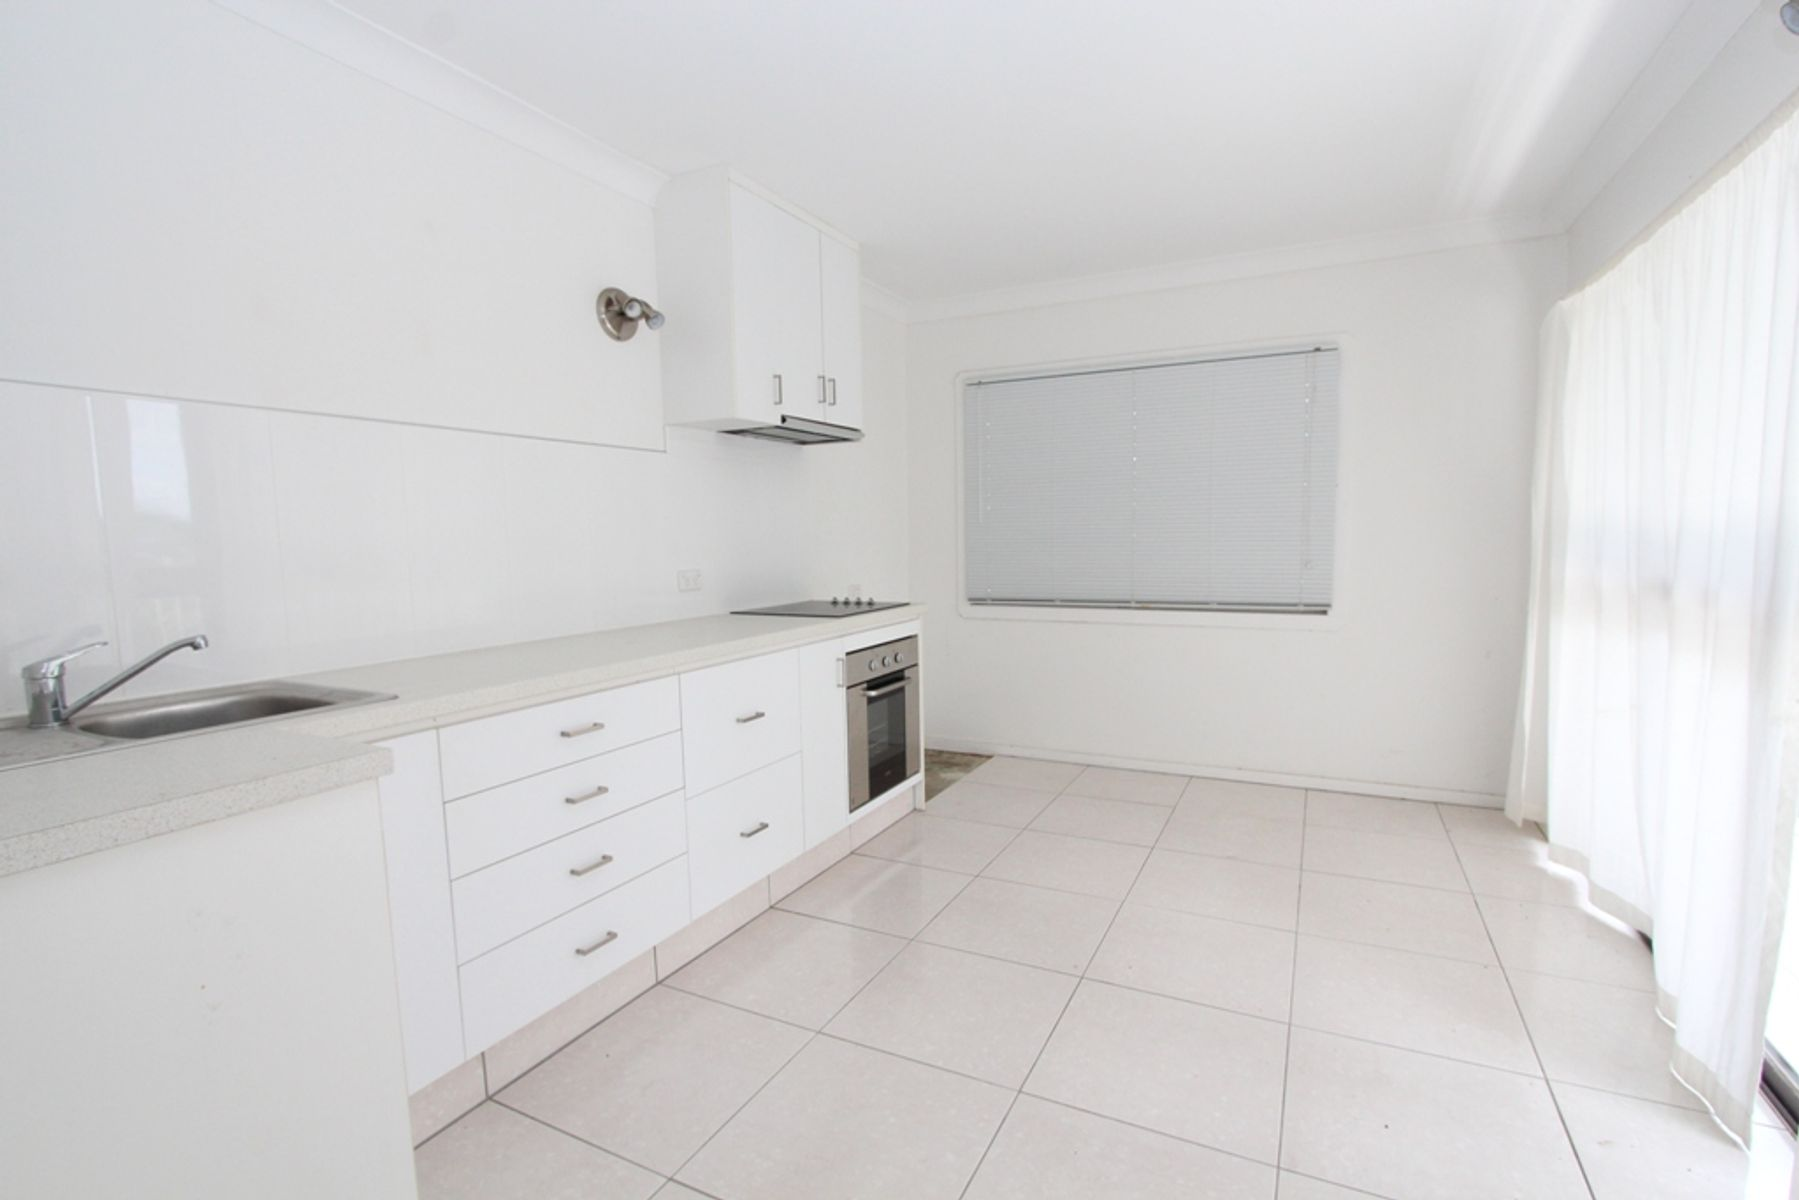 6 Erbacher Rd, Nambour, QLD 4560